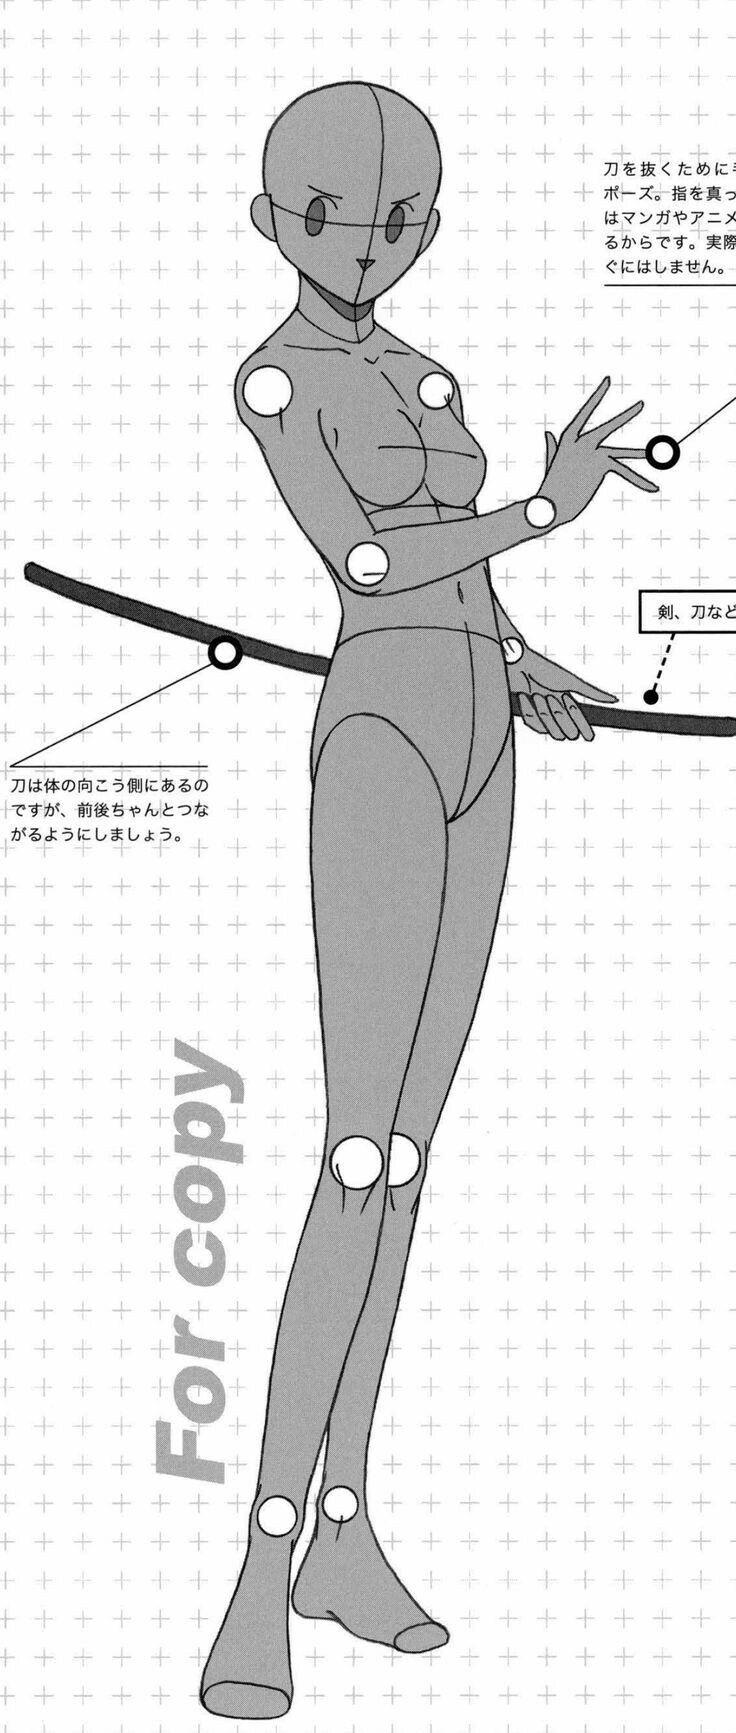 Female body, fighting stance, text, girl, katana, sword; How to Draw Manga/Anime